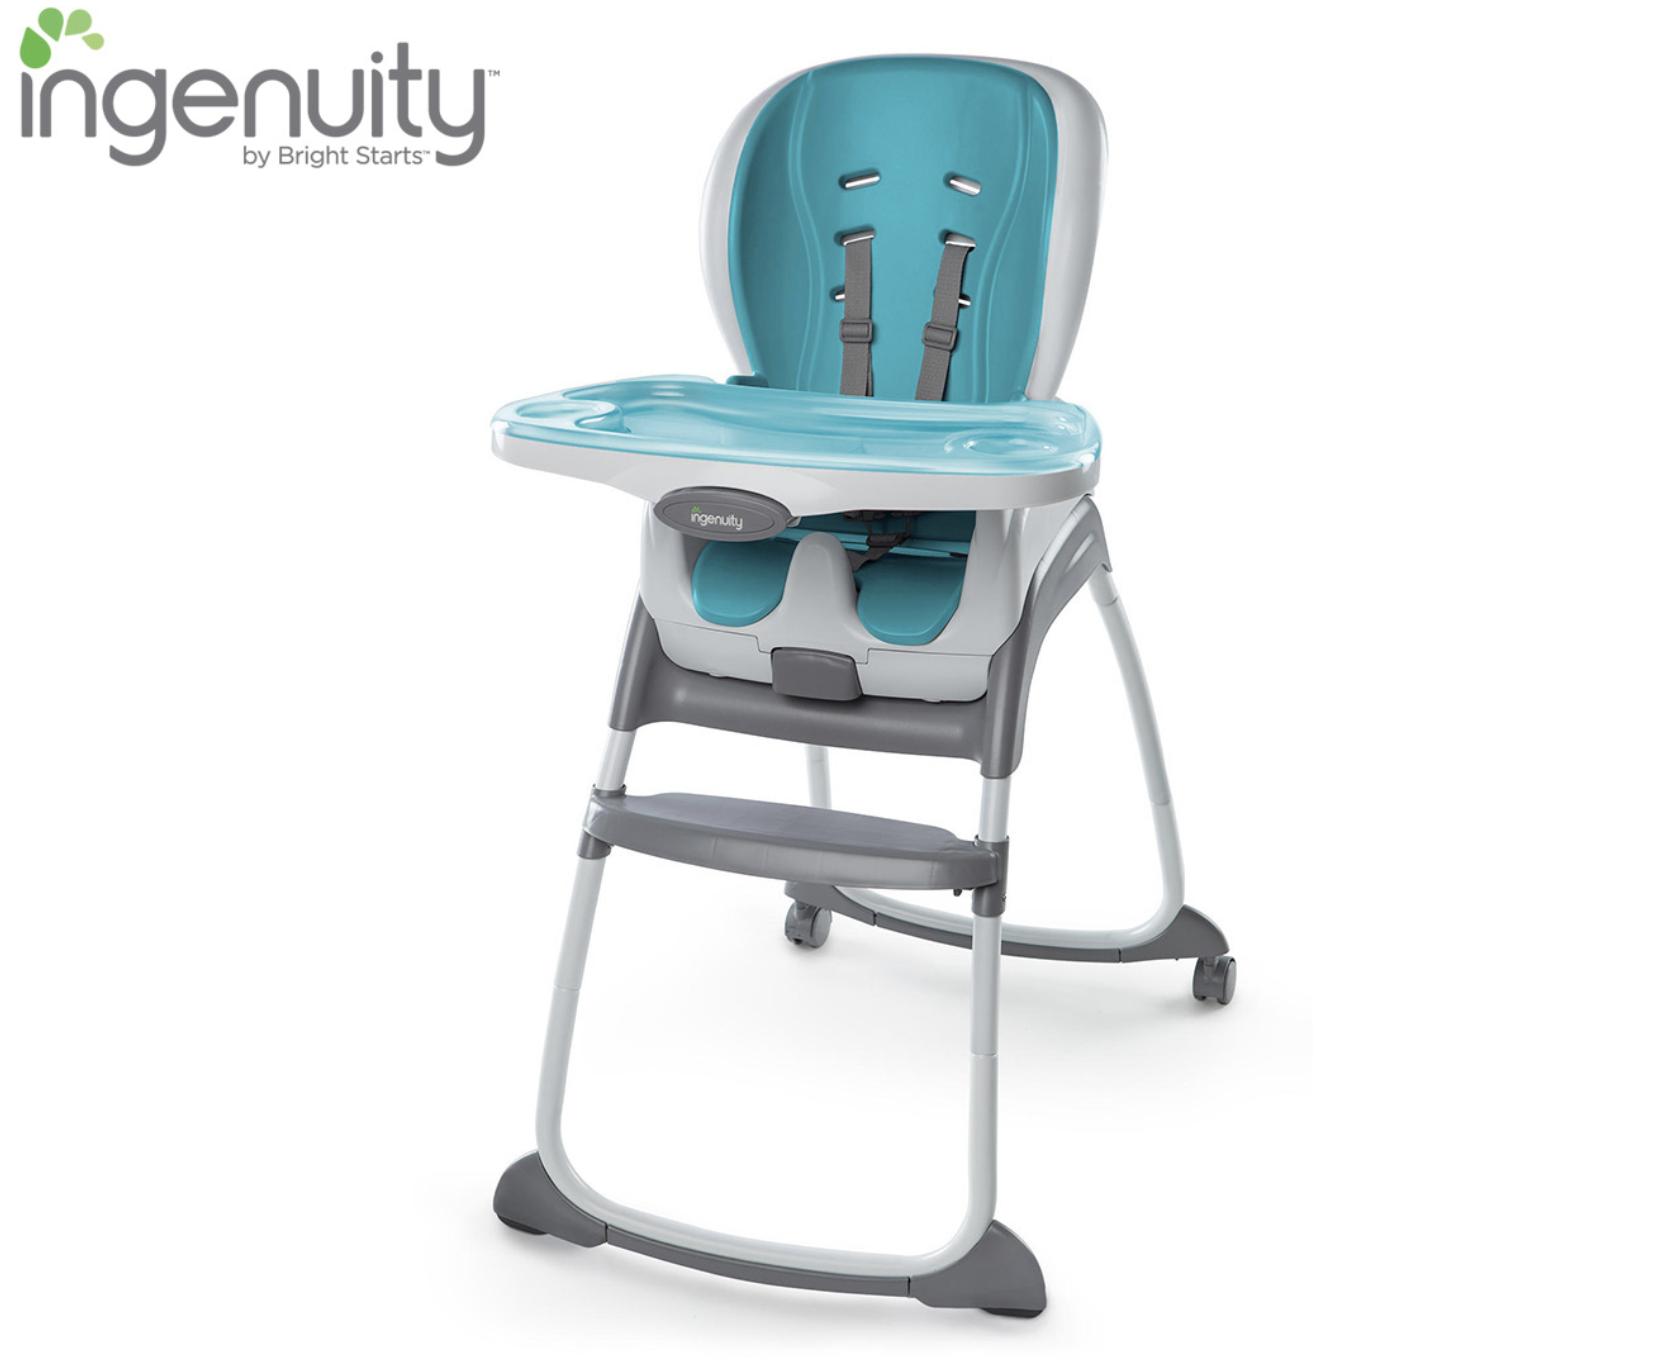 Chaise haute évolutive 3 en 1 AQUA – INGENUITY